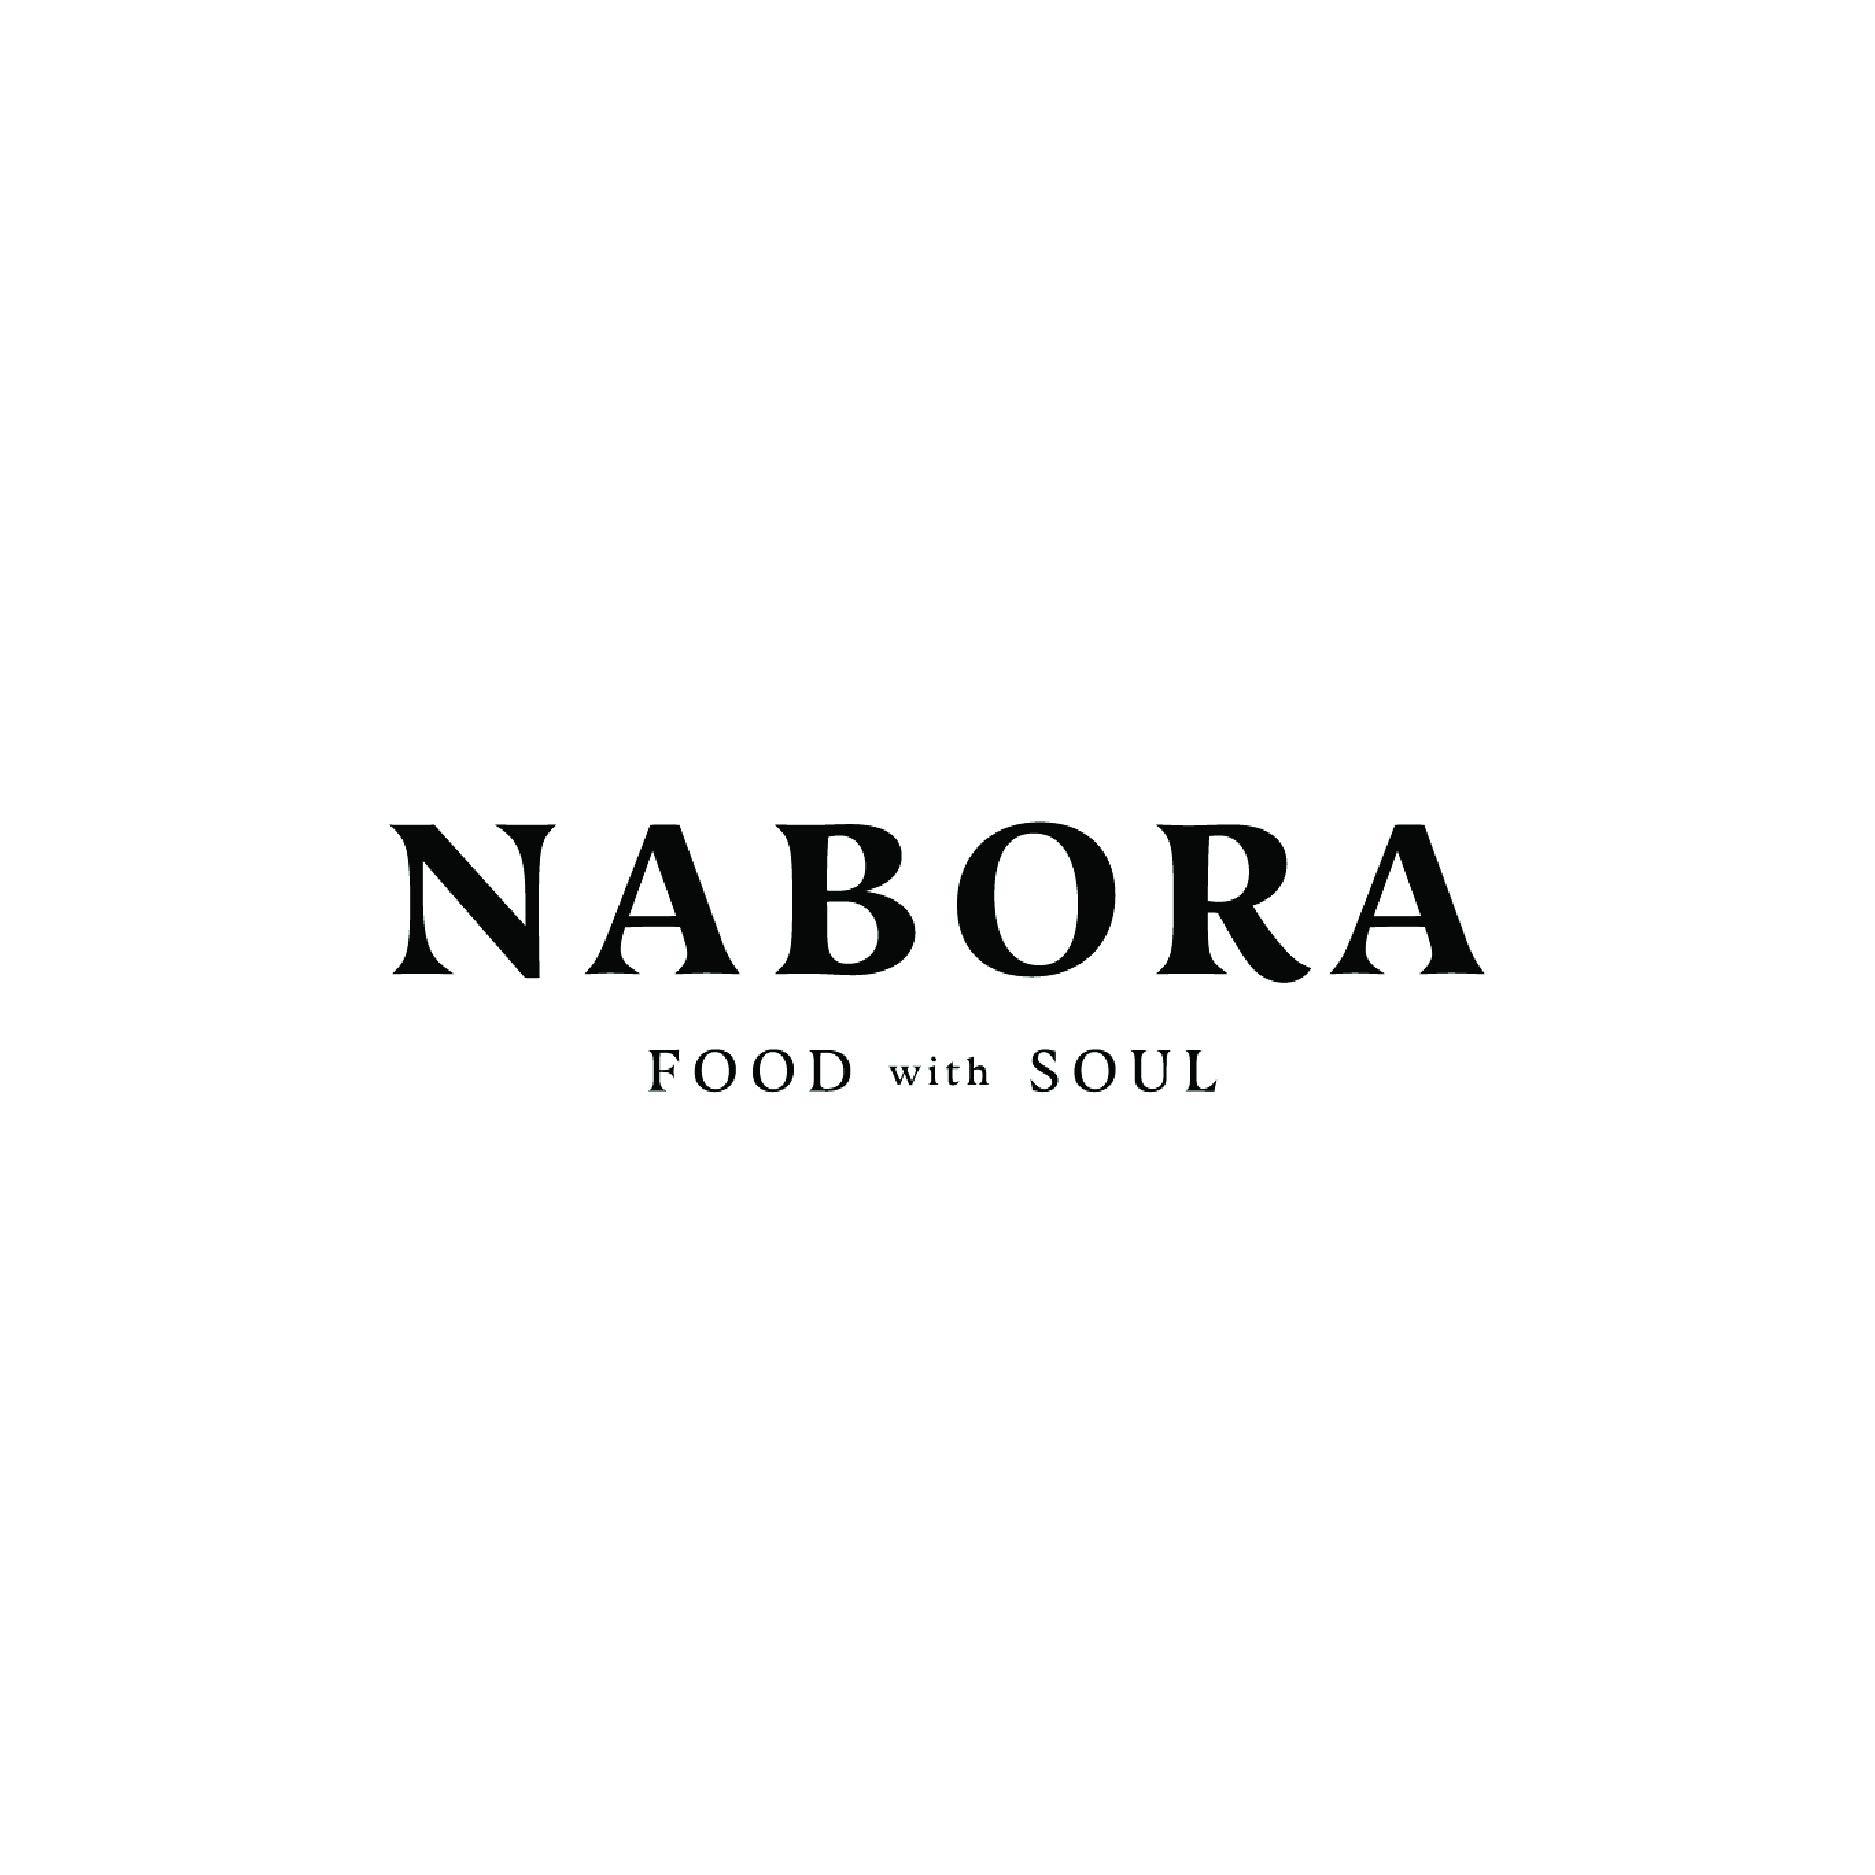 Nabora